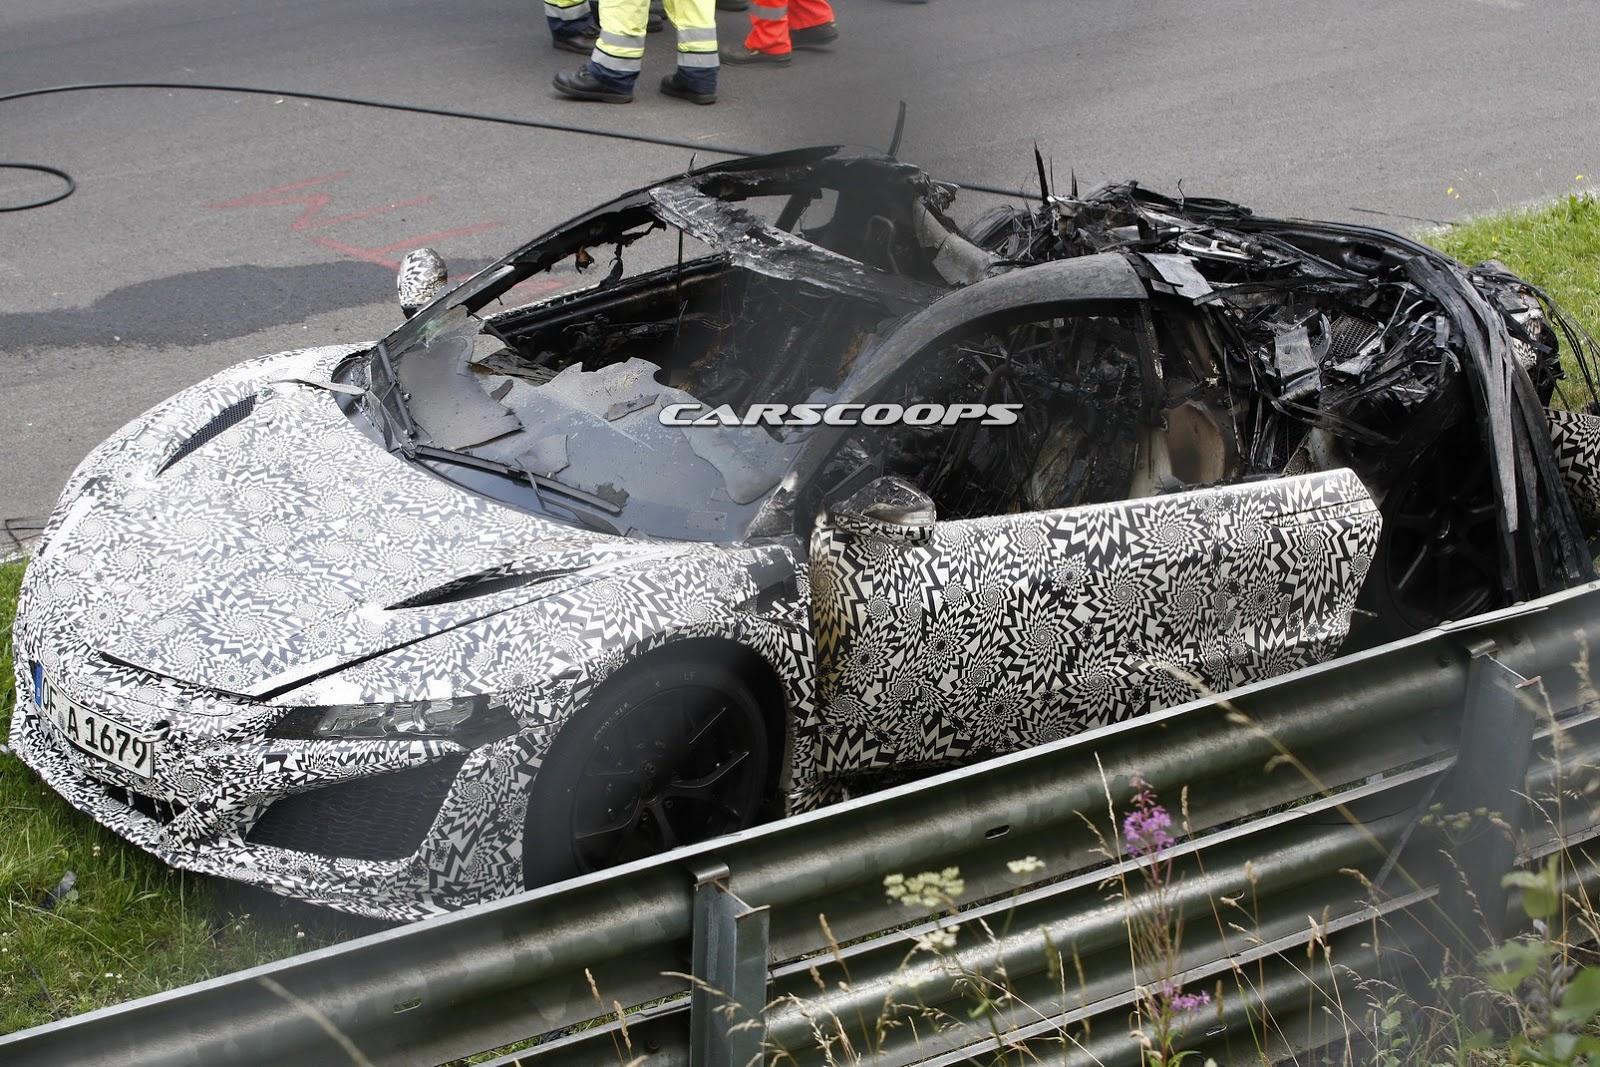 2016-Acura-Honda-NSX-Fire-4Carscoops.jpg